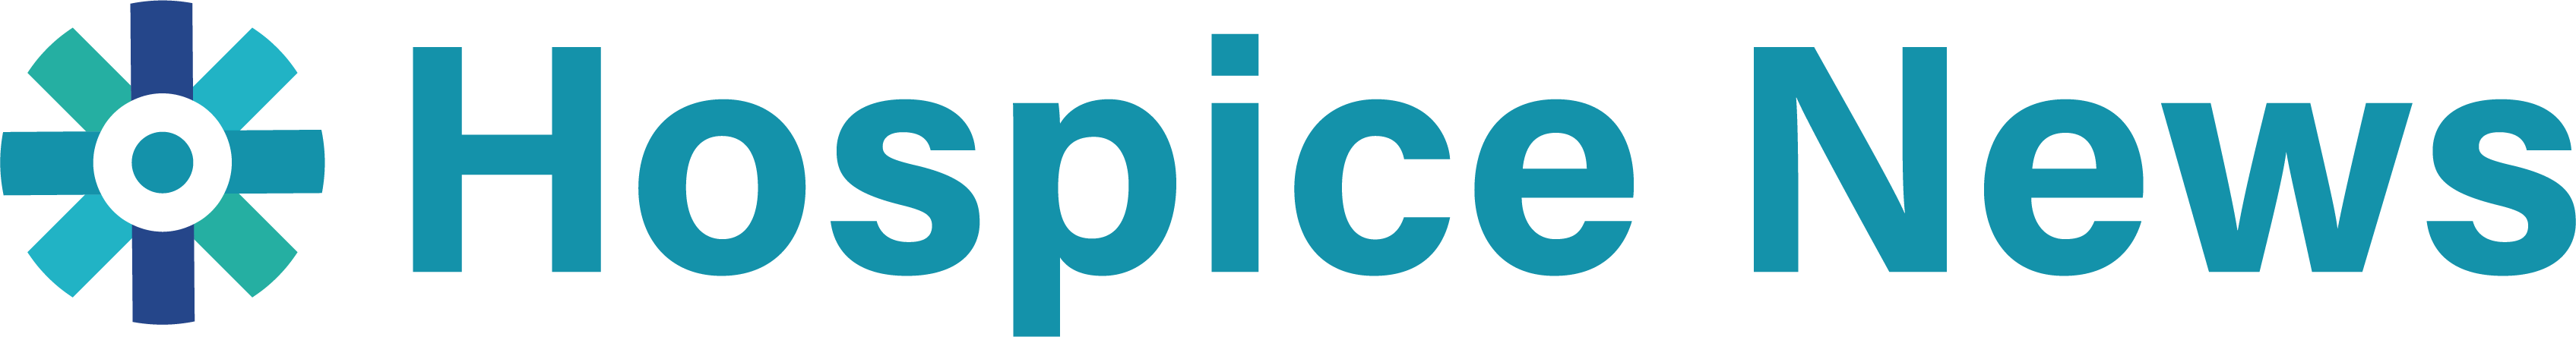 Hospice News Logo